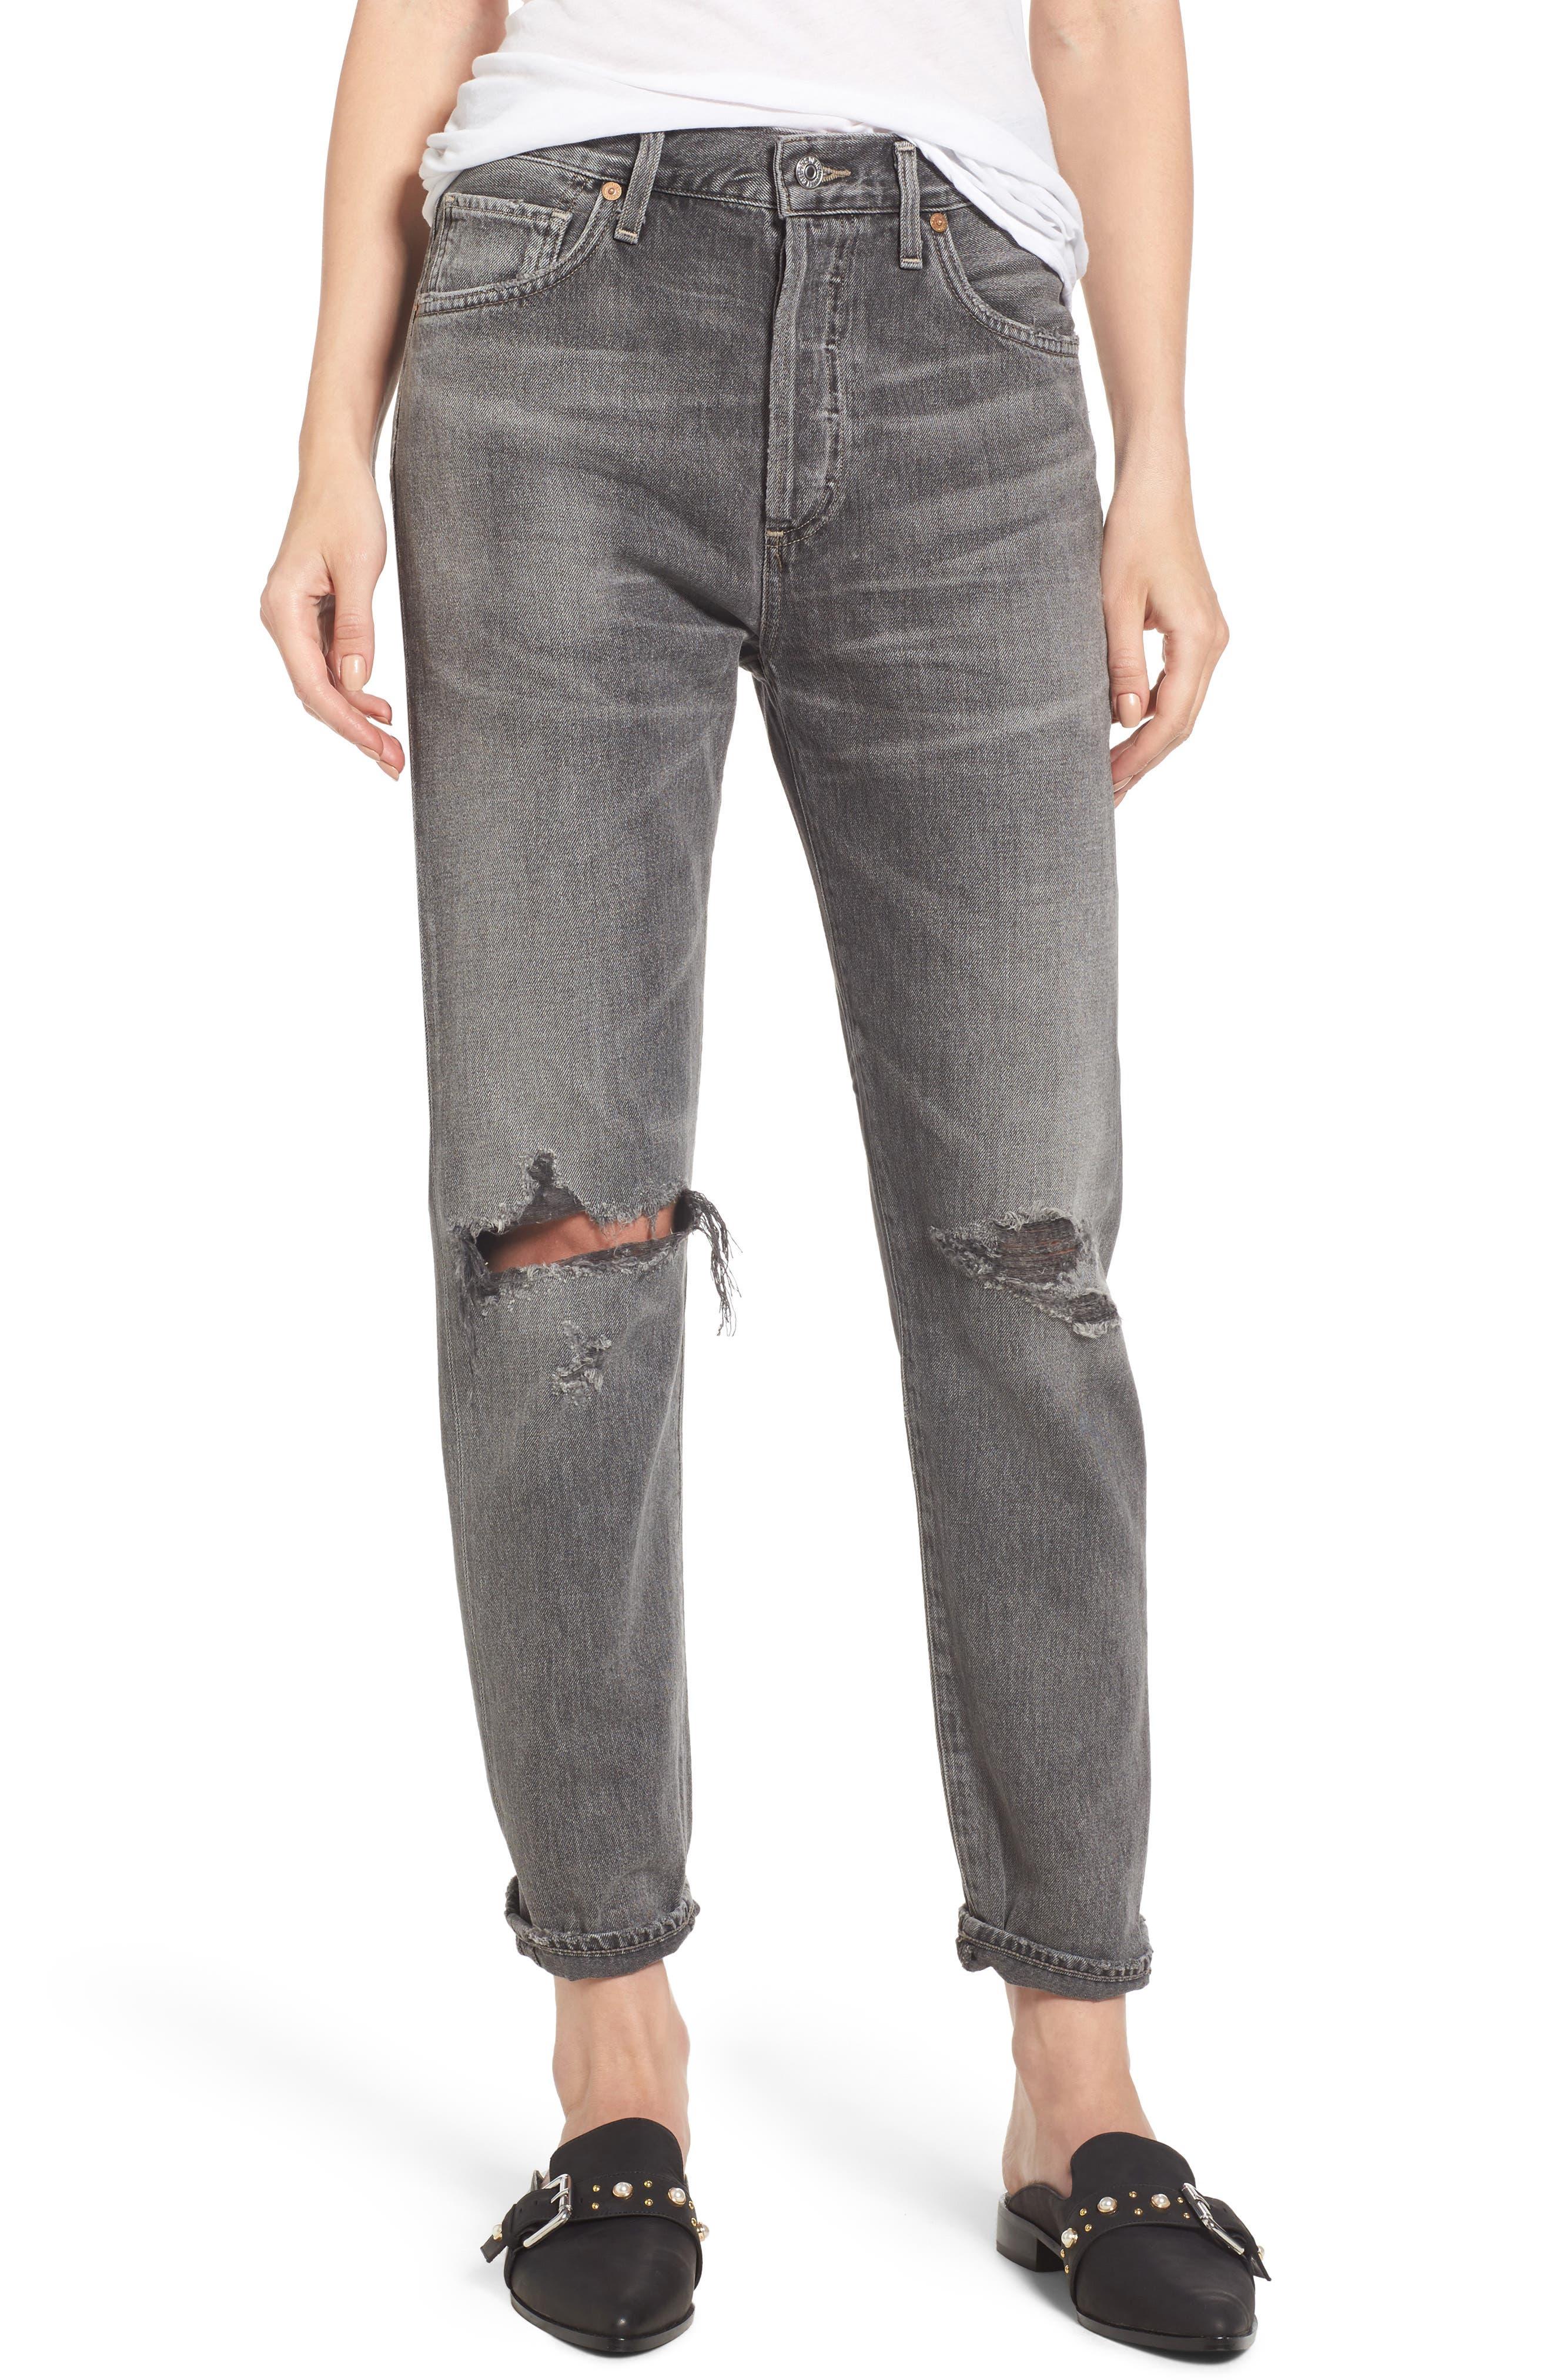 Liya High Waist Boyfriend Jeans,                         Main,                         color, Extreme